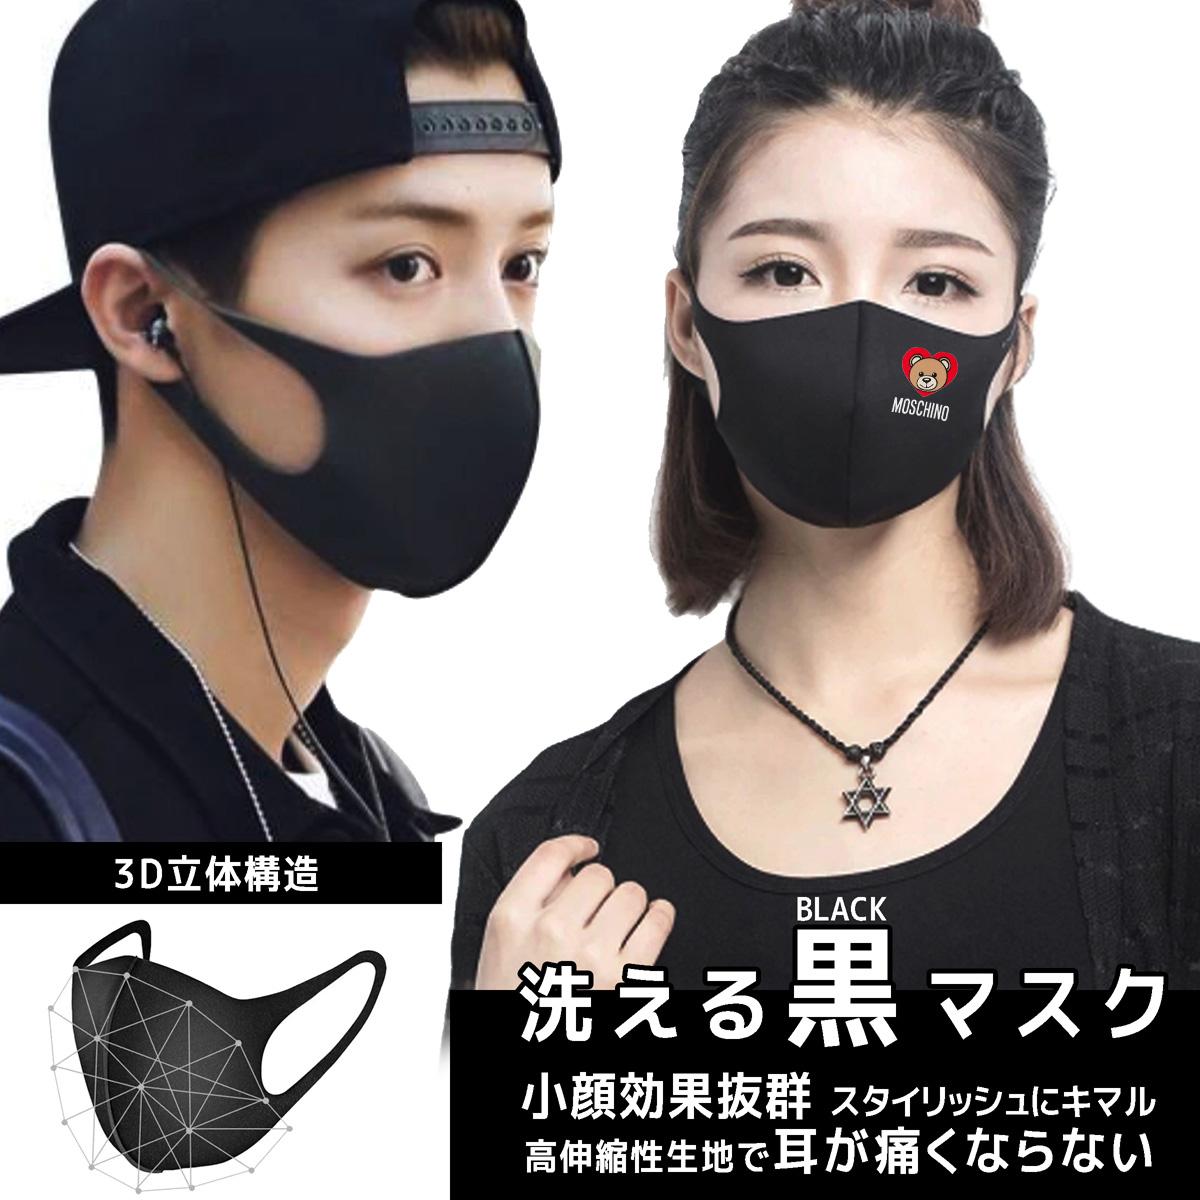 MOSCHINO brand cute cartoon masks